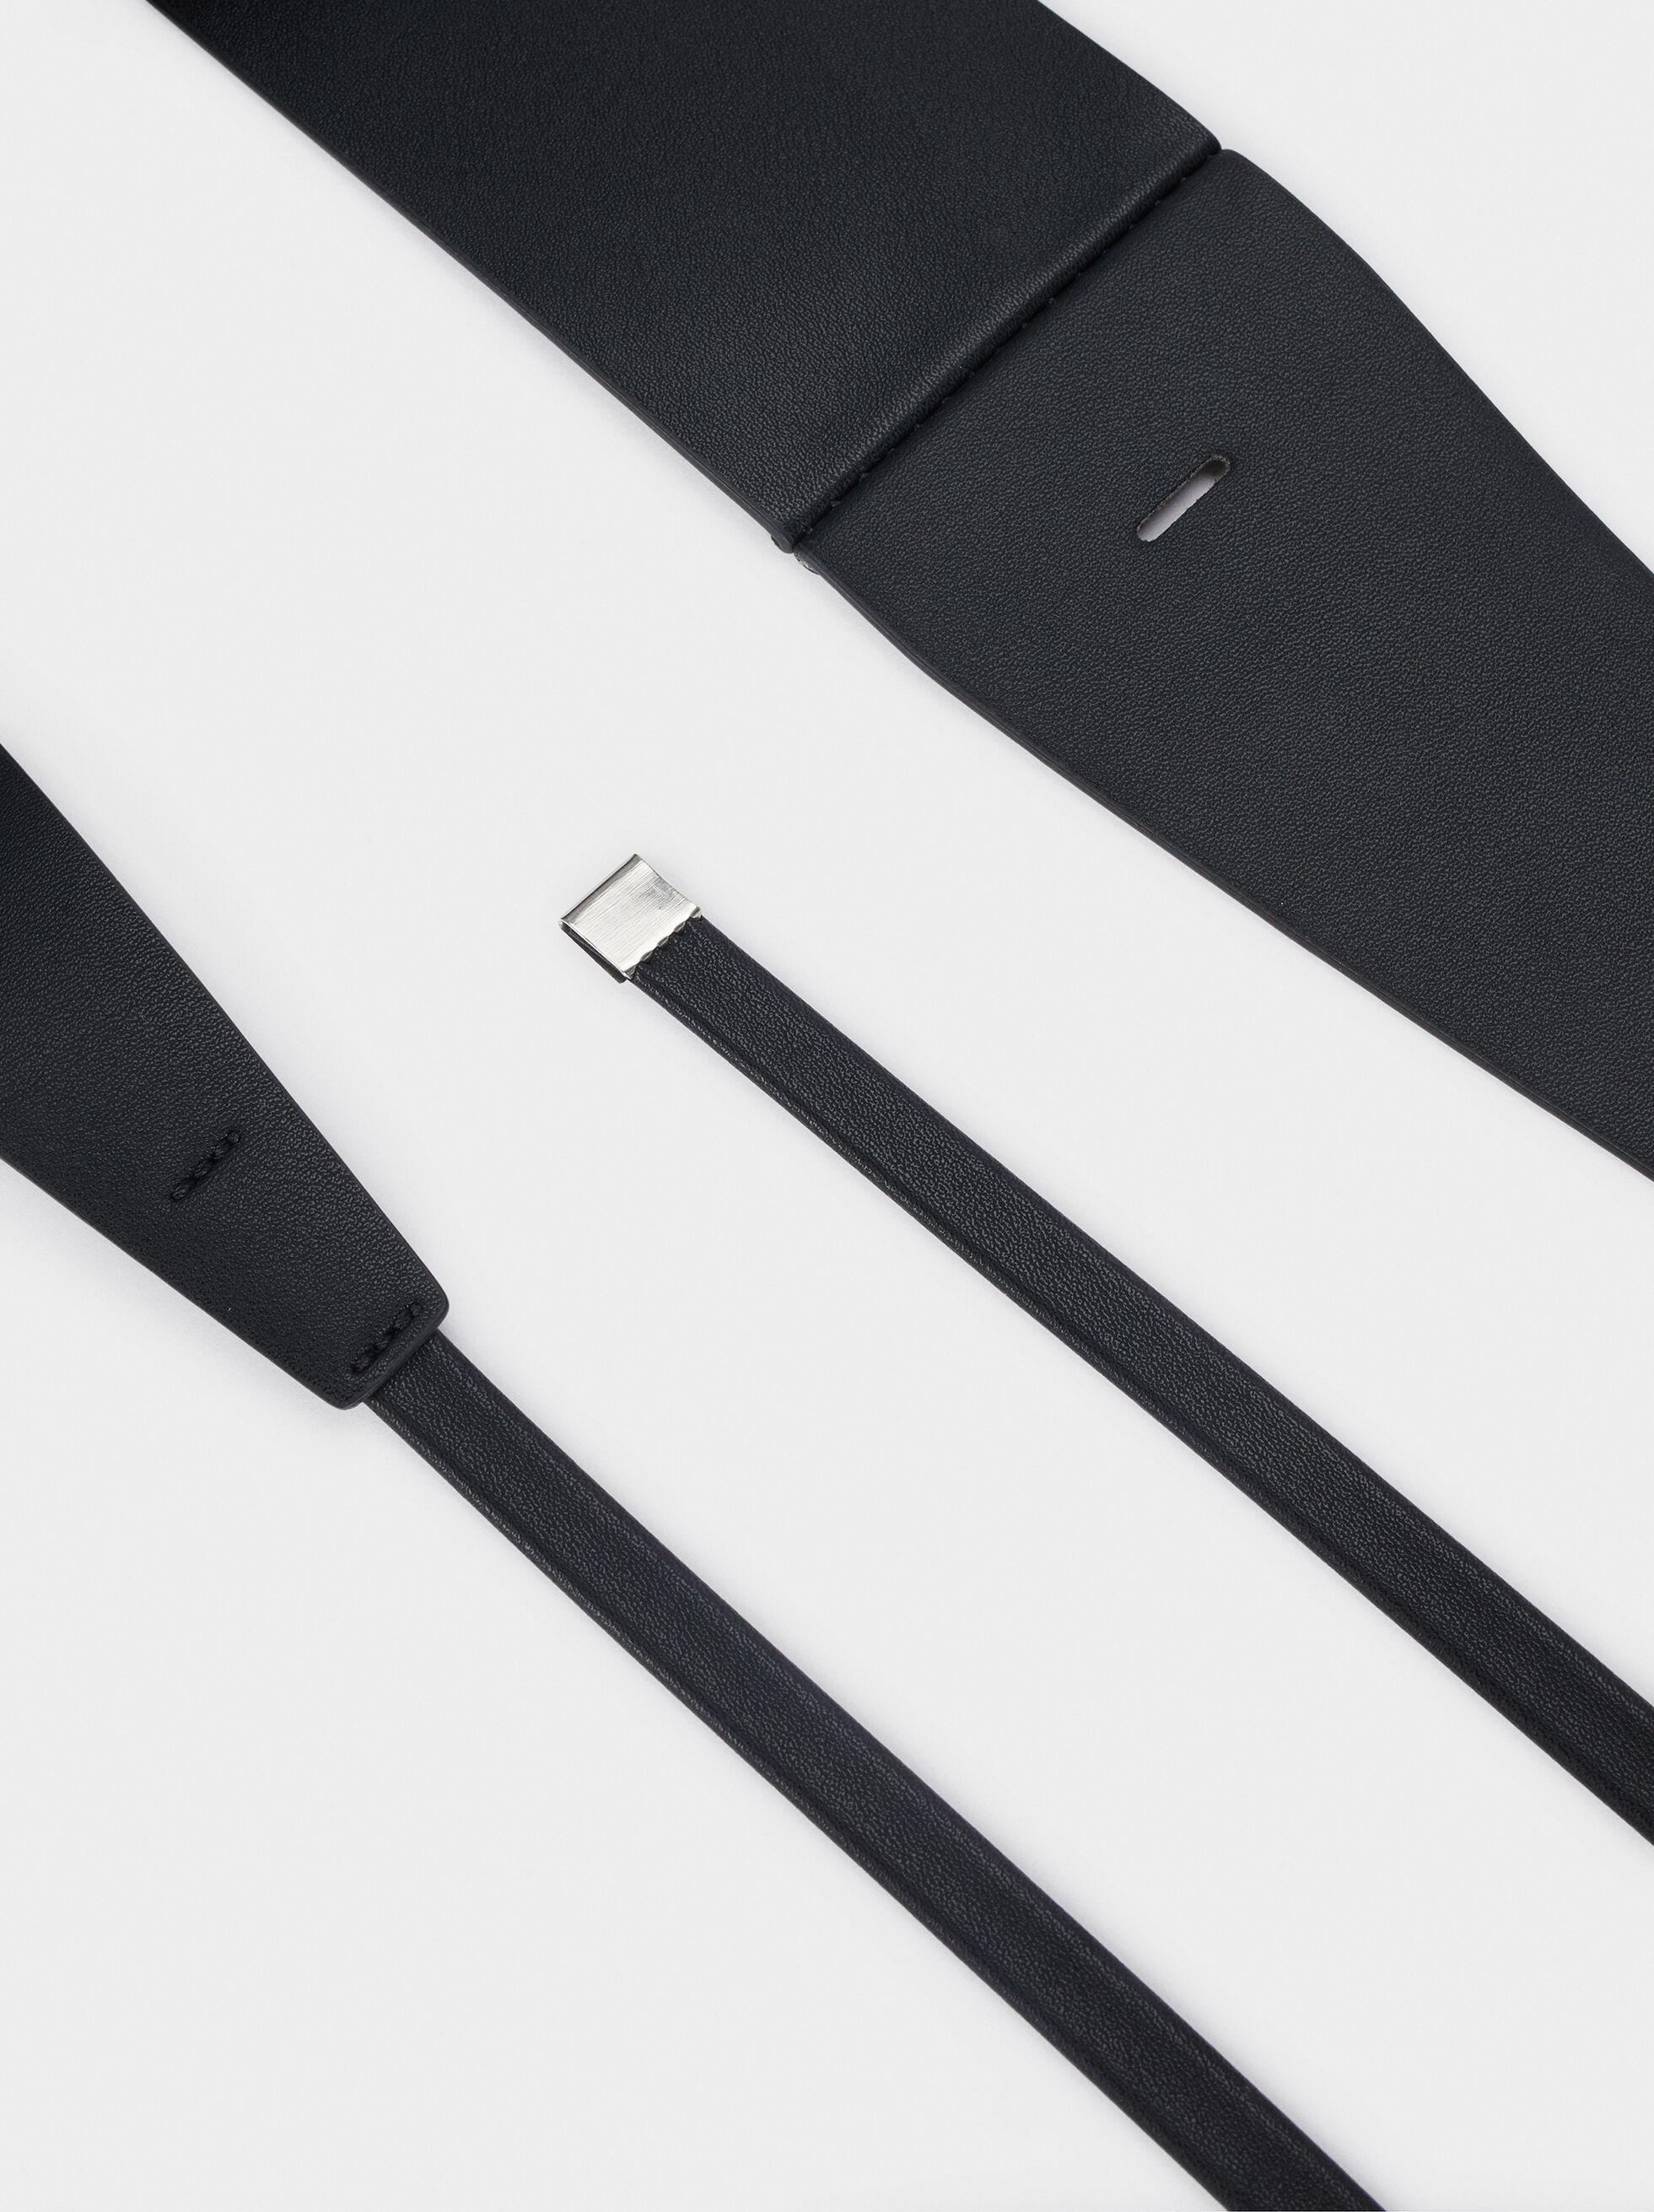 Leather Texture Long Belt, Black, hi-res